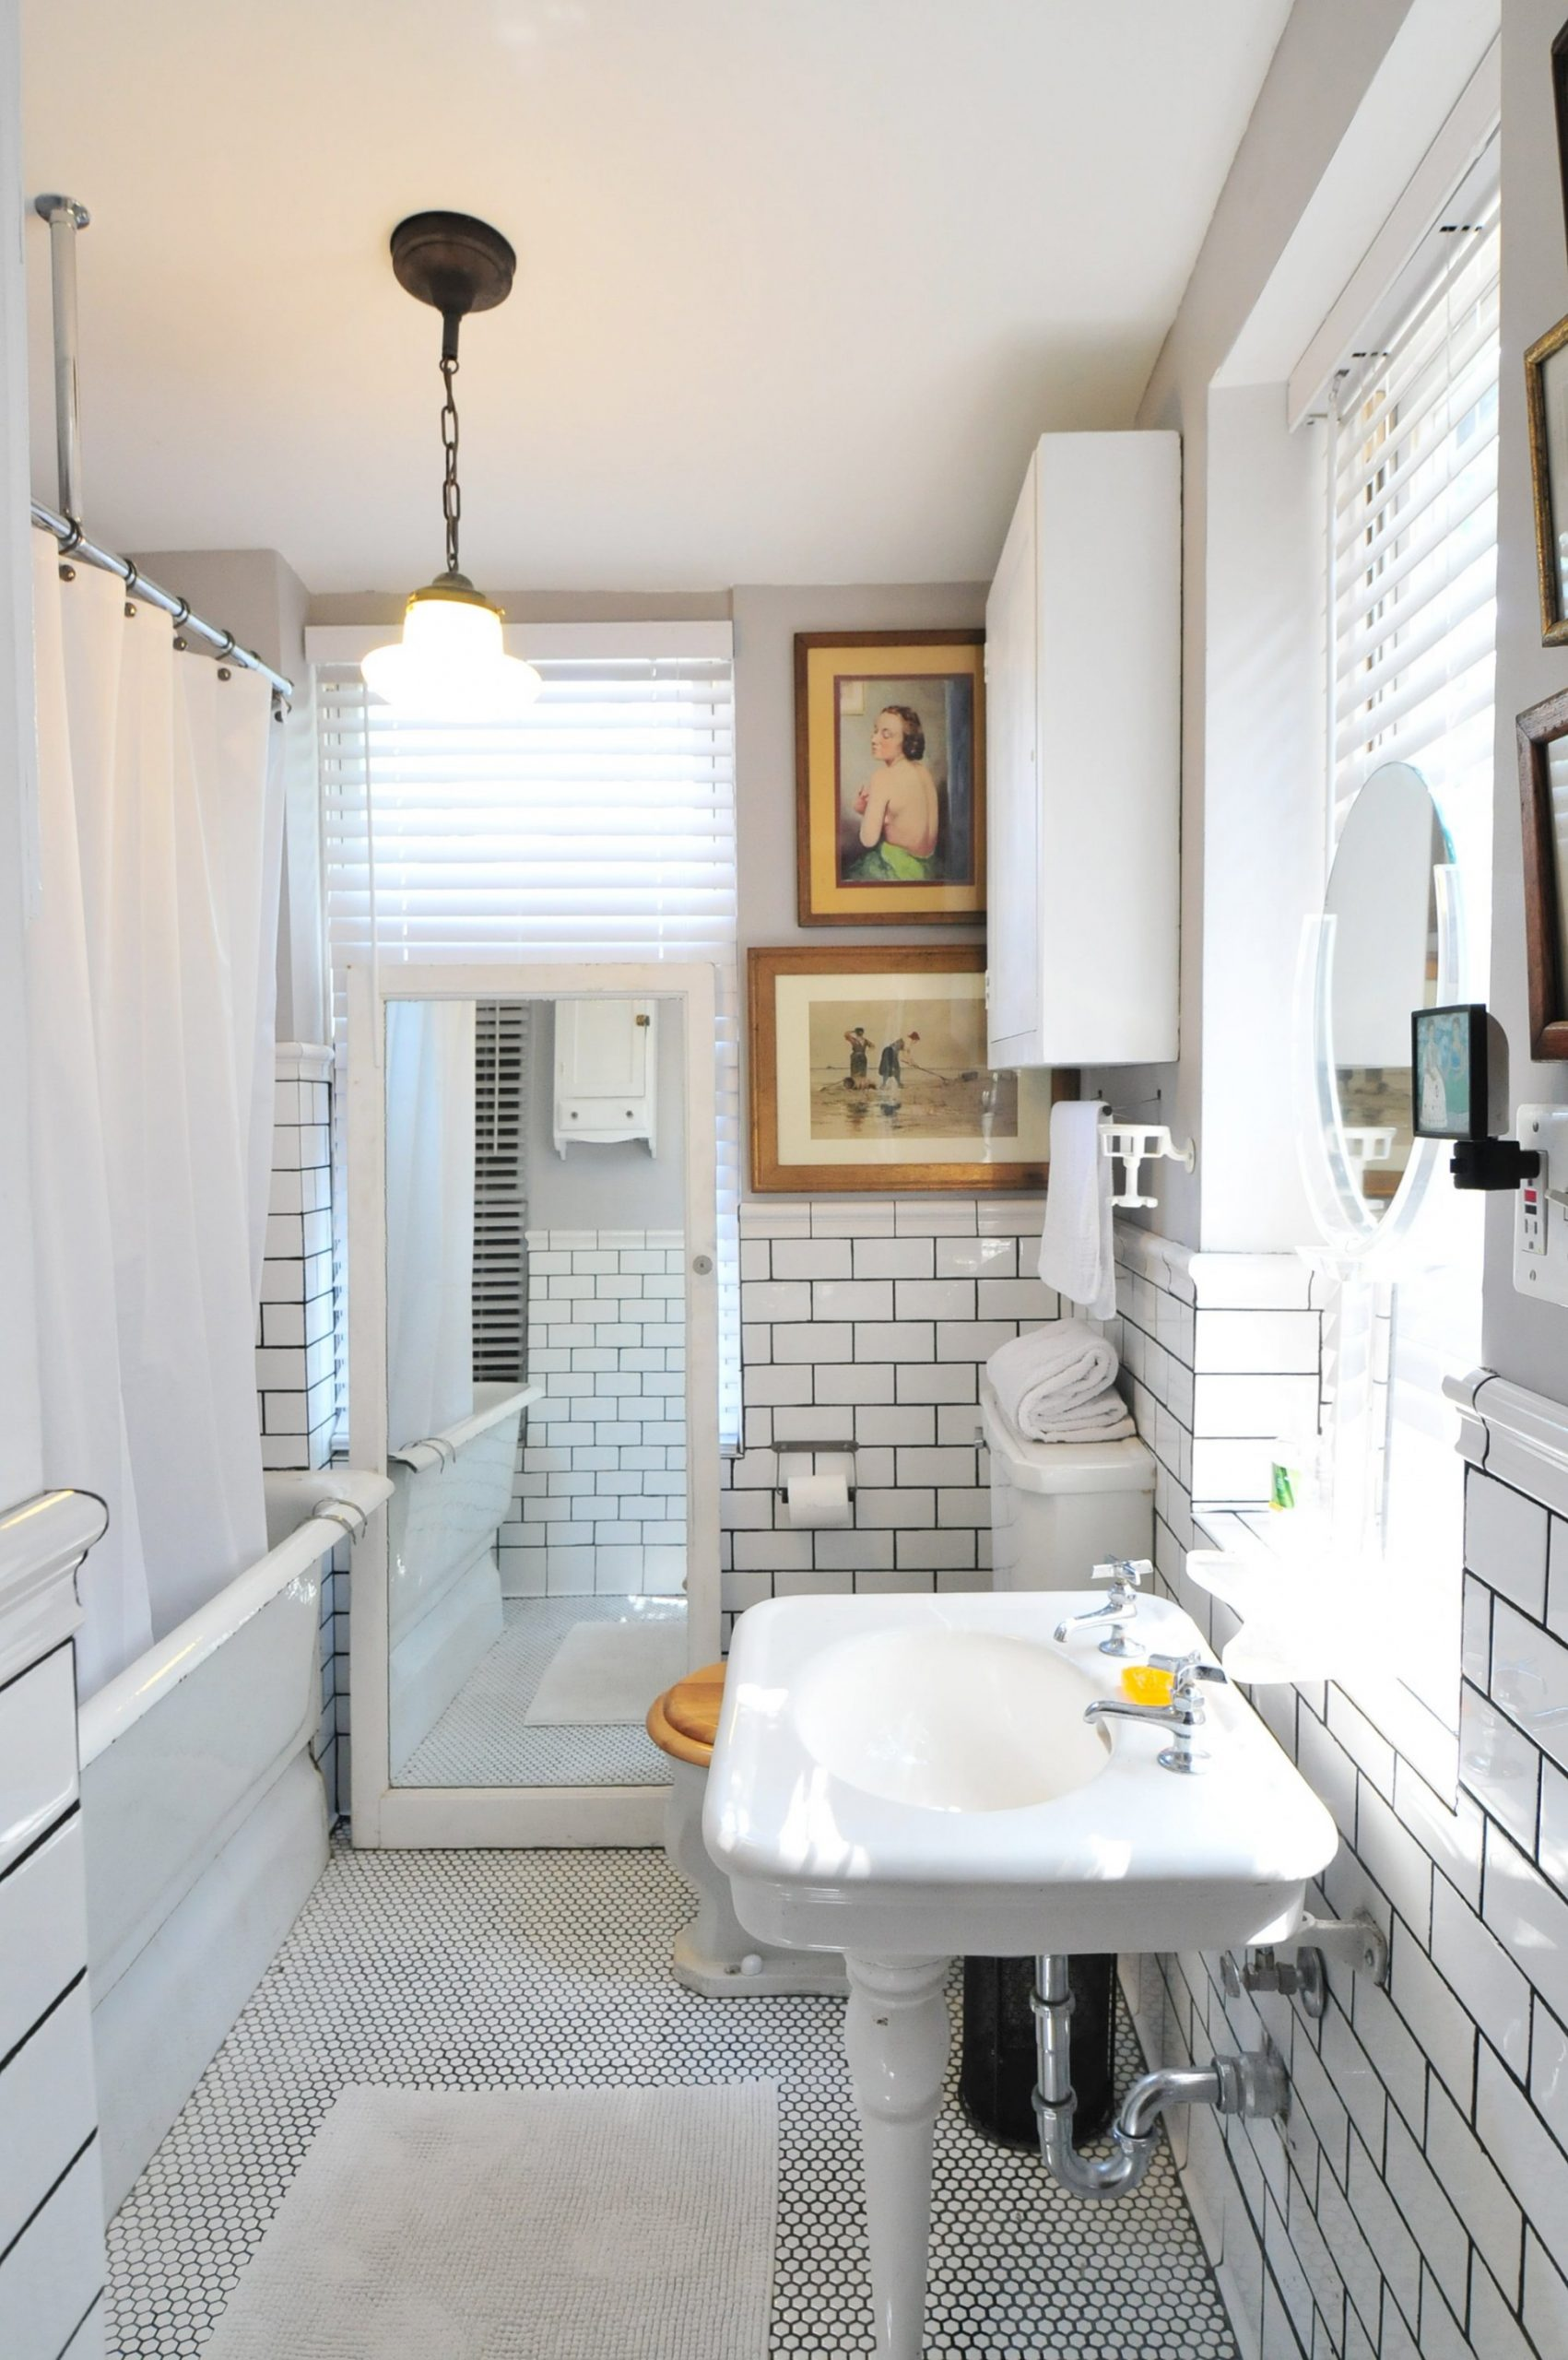 9 Best Bathroom Design Ideas  Apartment Therapy - Bathroom Ideas Apartment Therapy